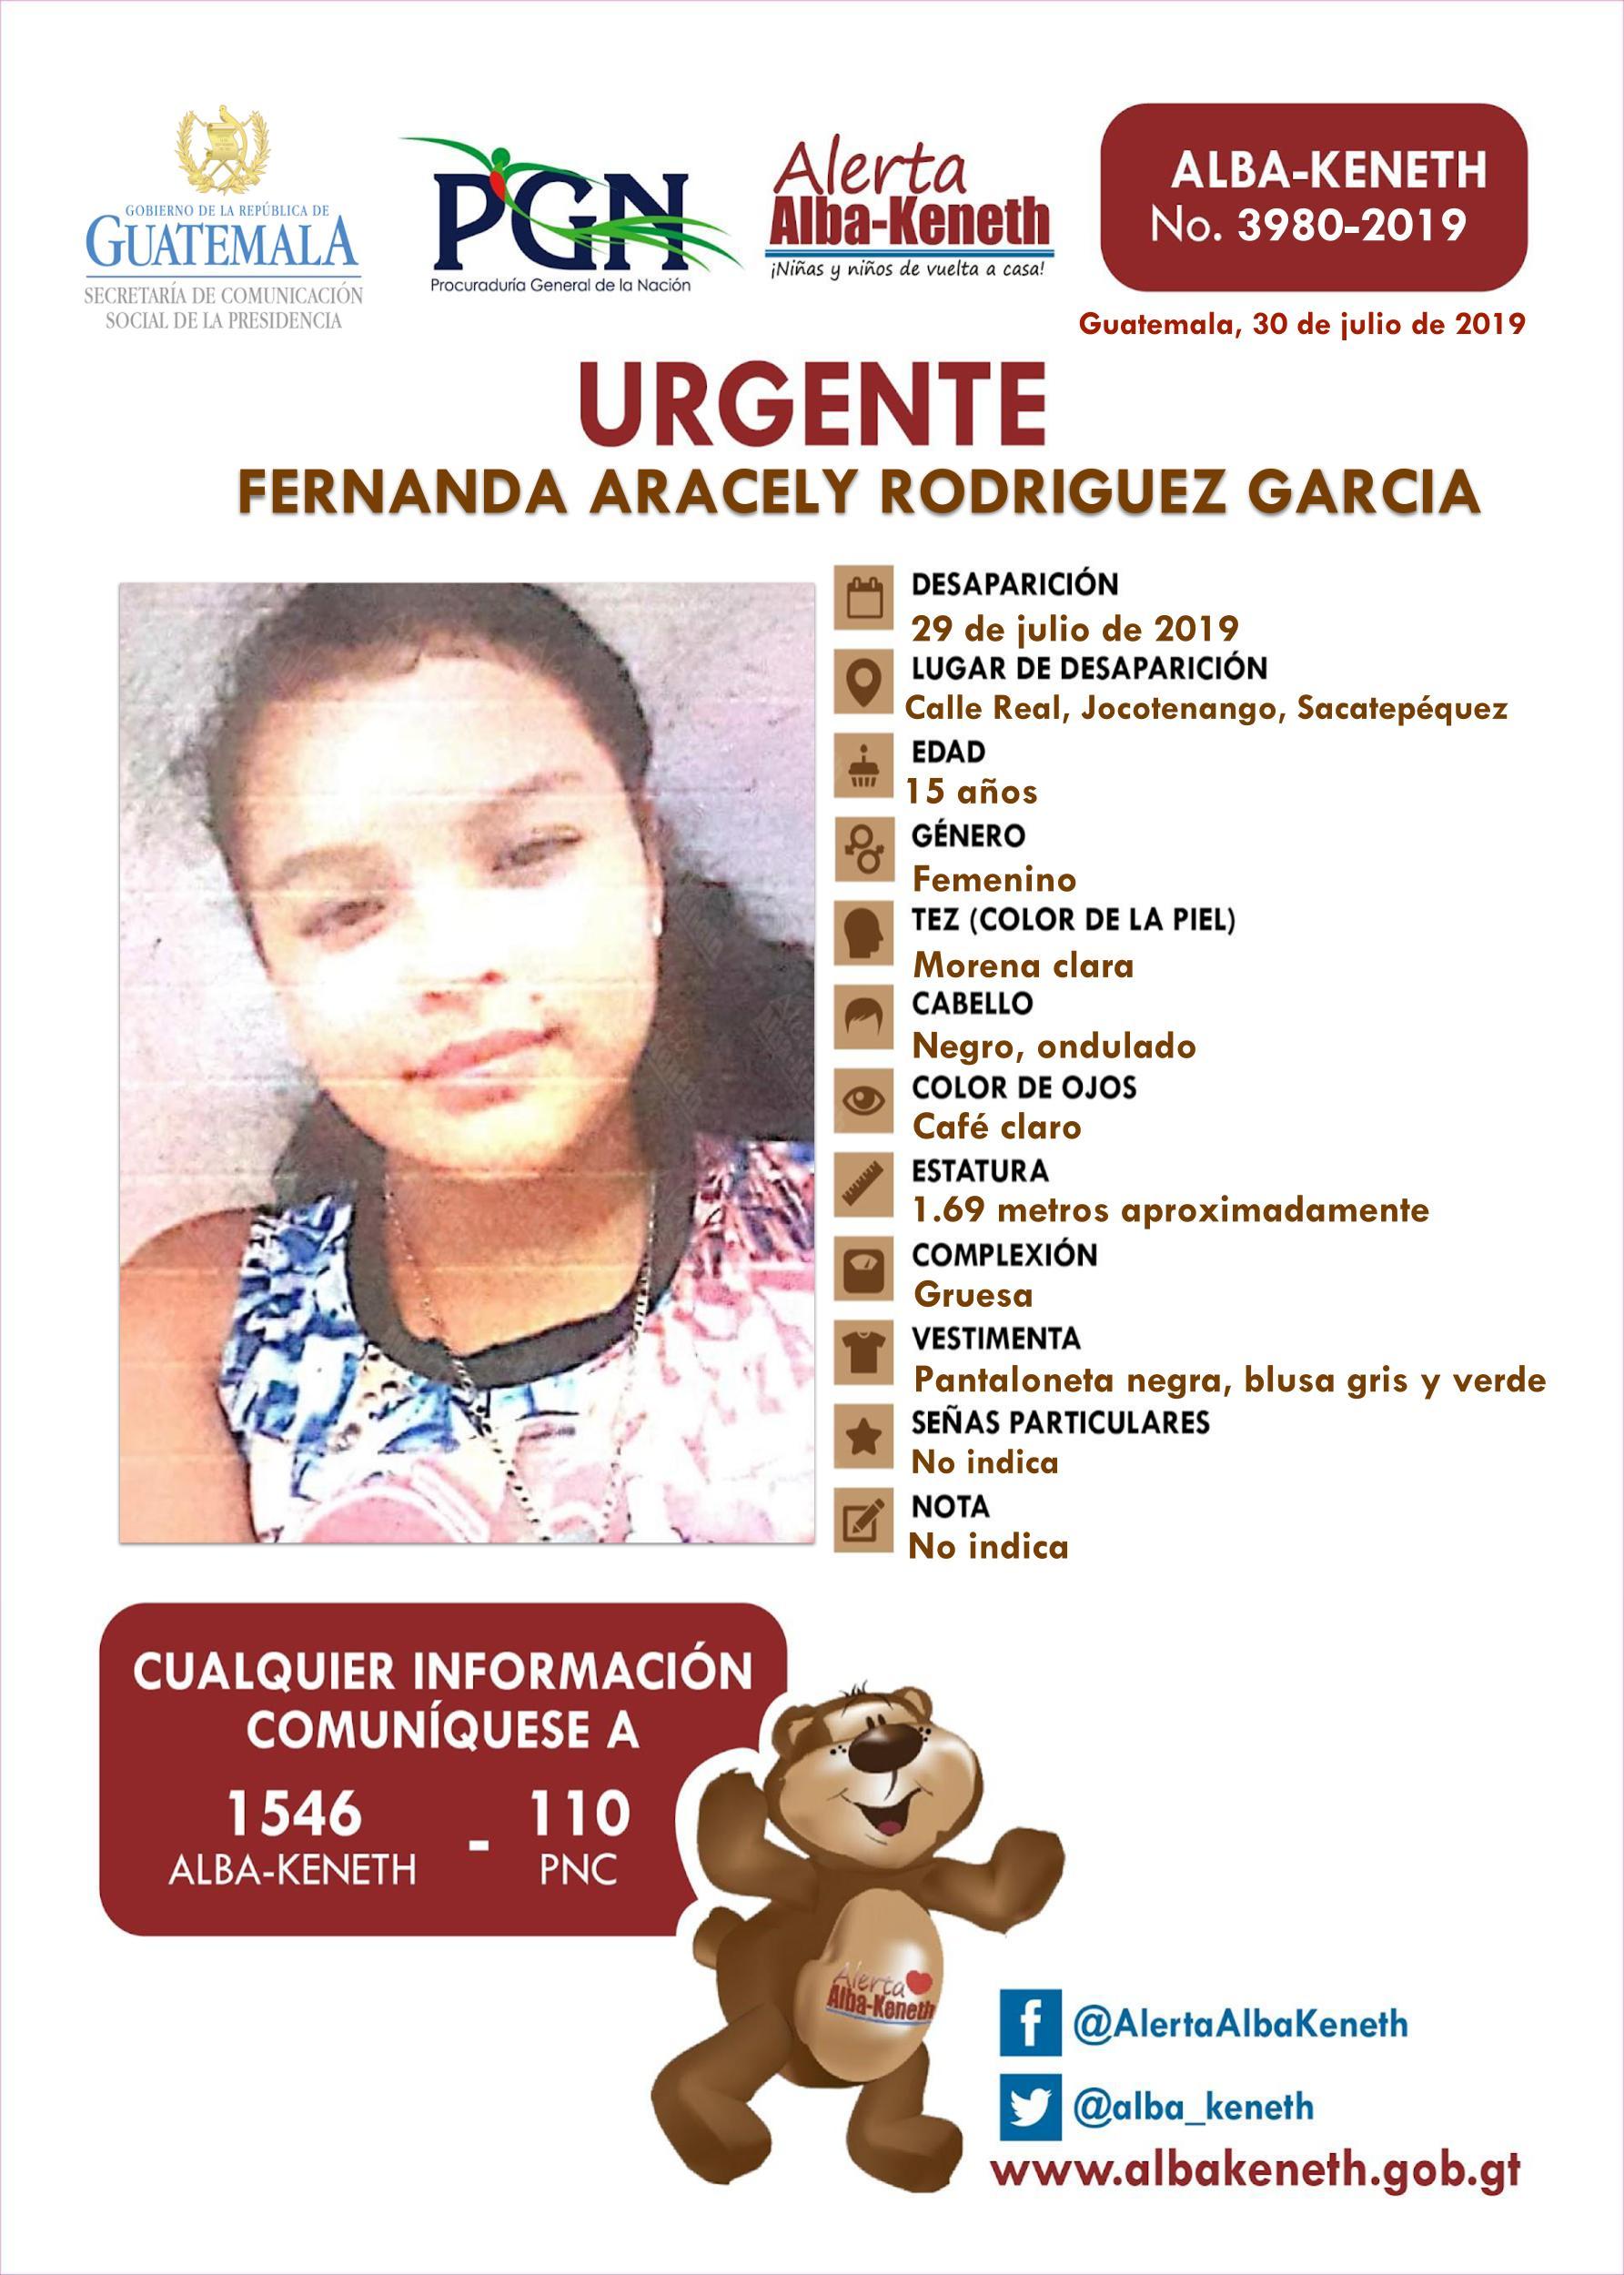 Fernanda Aracely Rodriguez Garcia